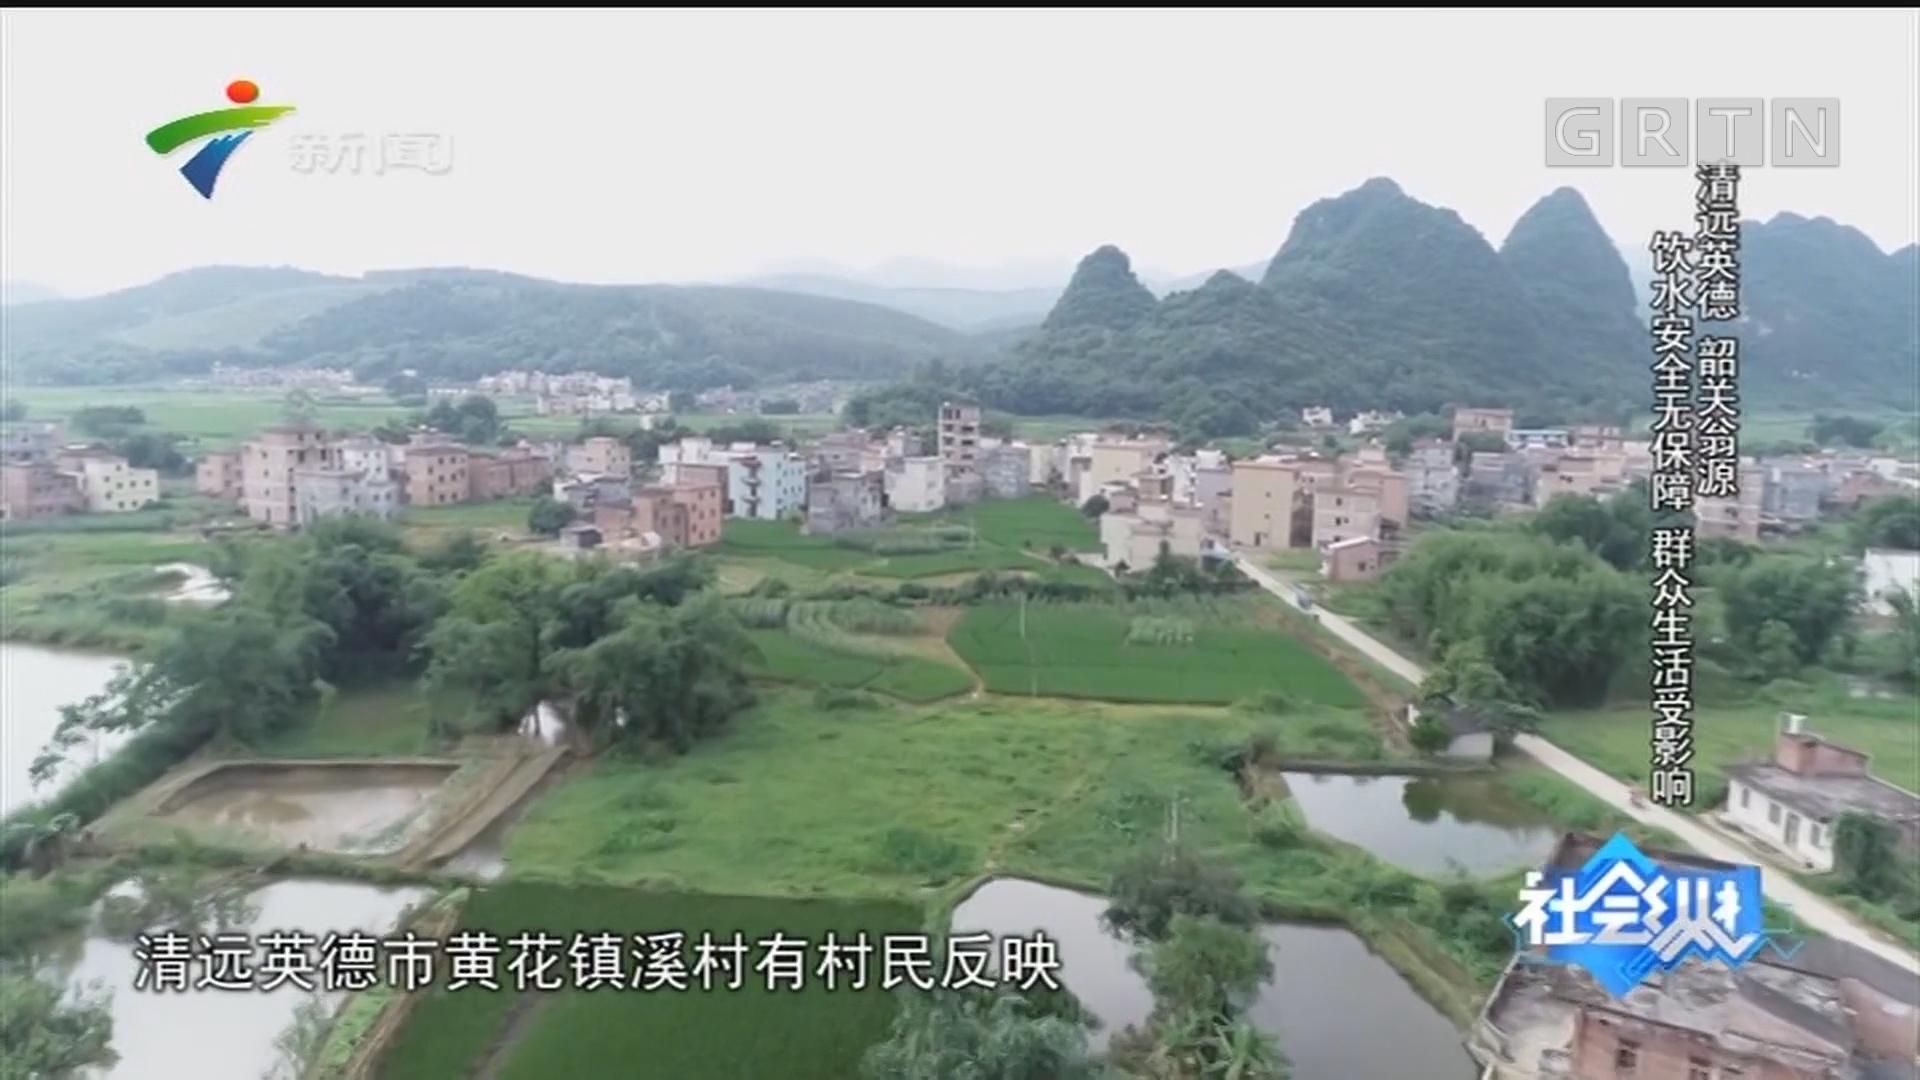 [HD][2019-08-30]社会纵横:清远英德 韶关翁源 饮水安全无保障 群众生活受影响